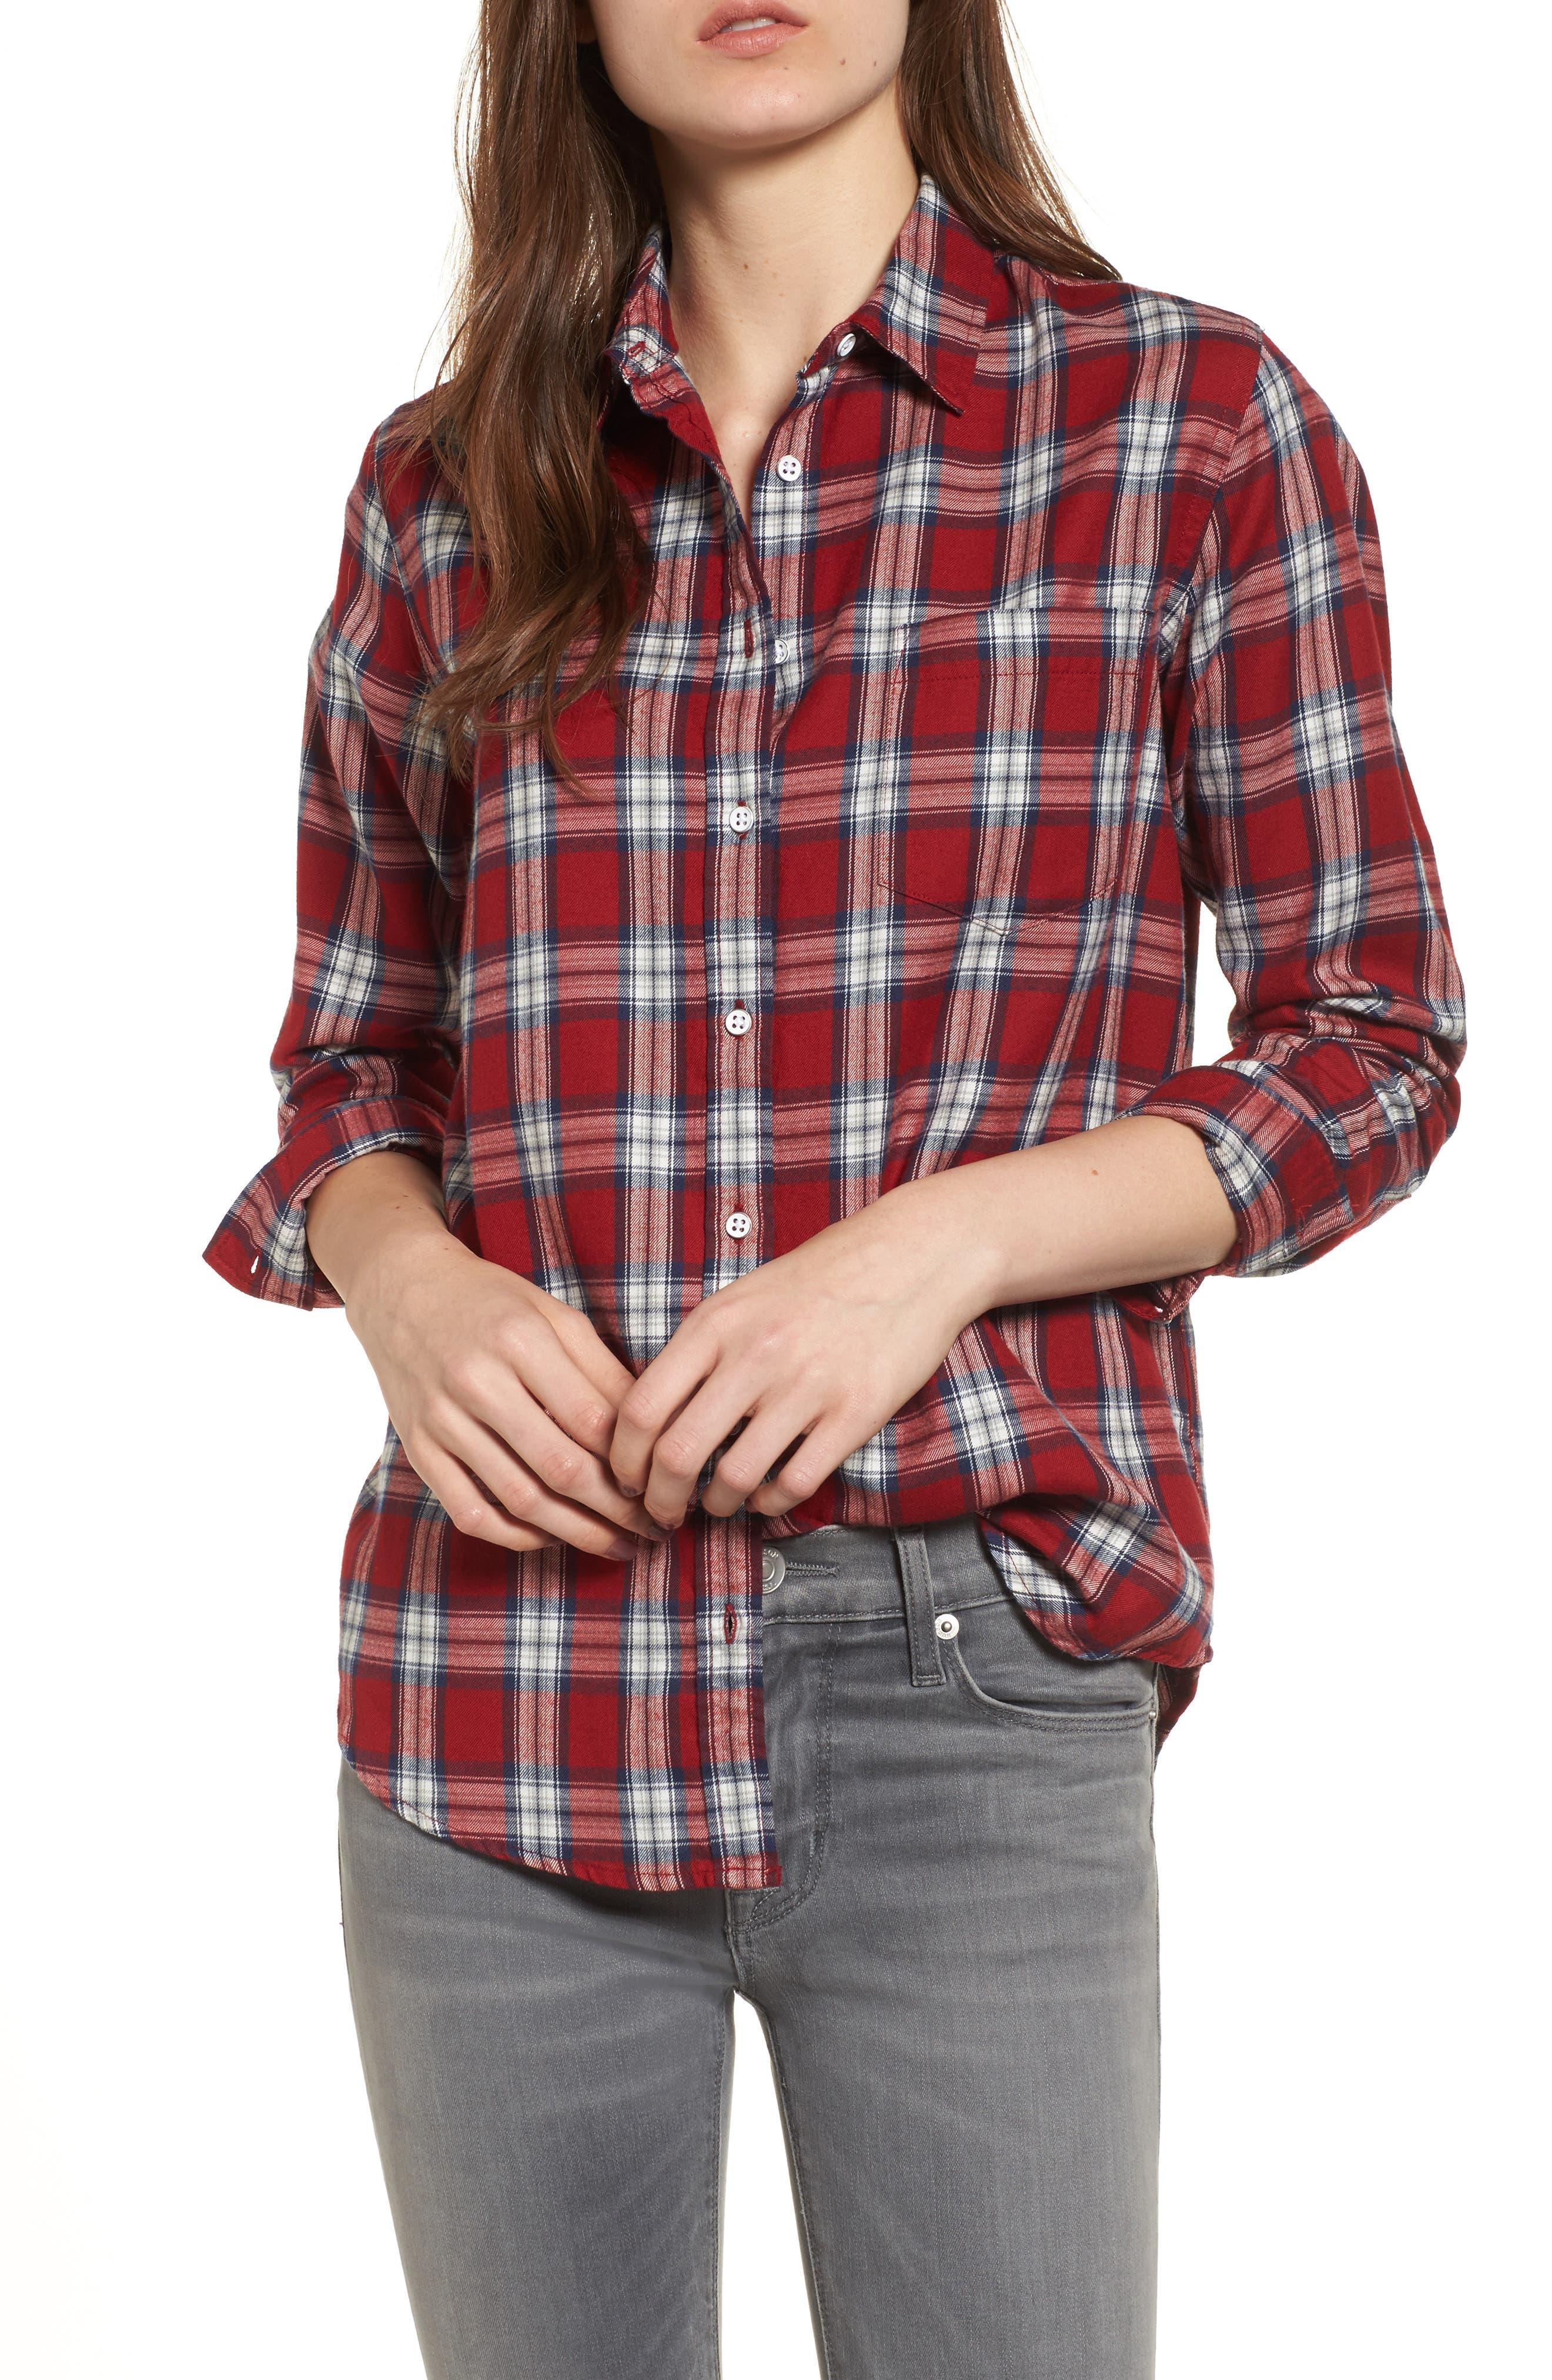 Mercer & Spring Plaid Shirt,                             Main thumbnail 1, color,                             Red Plaid